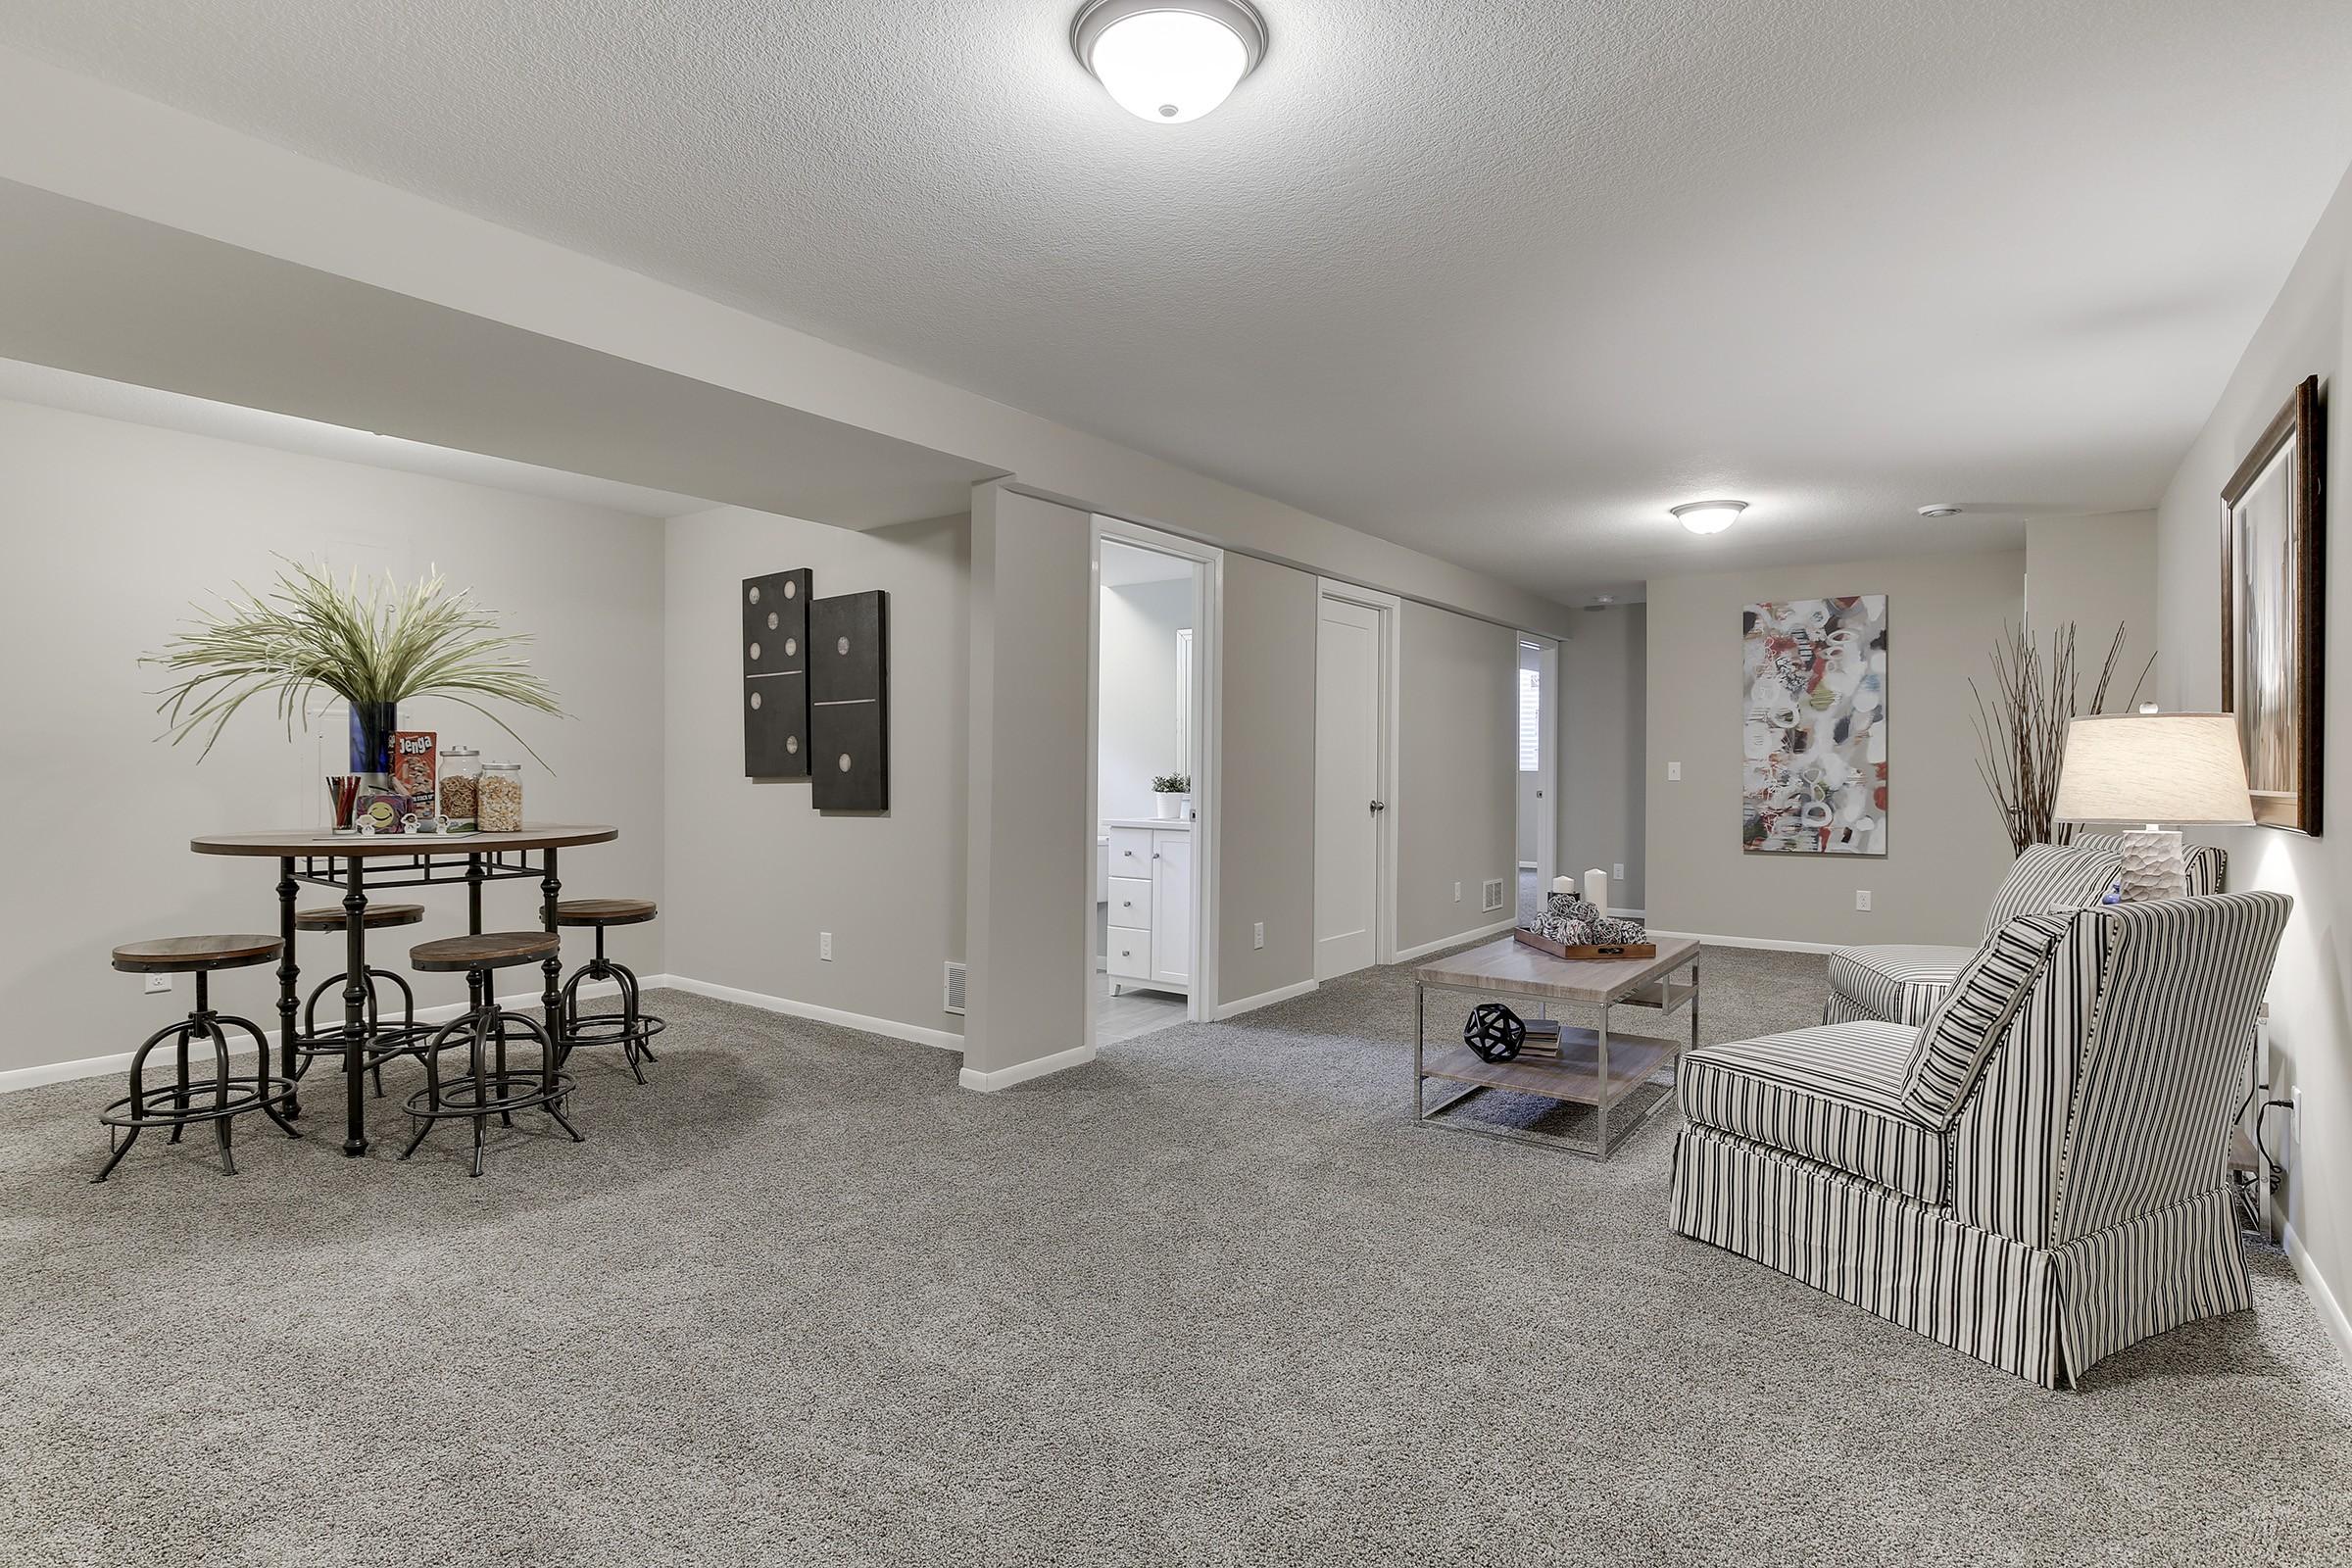 Basement Family Room and Wet Bar -